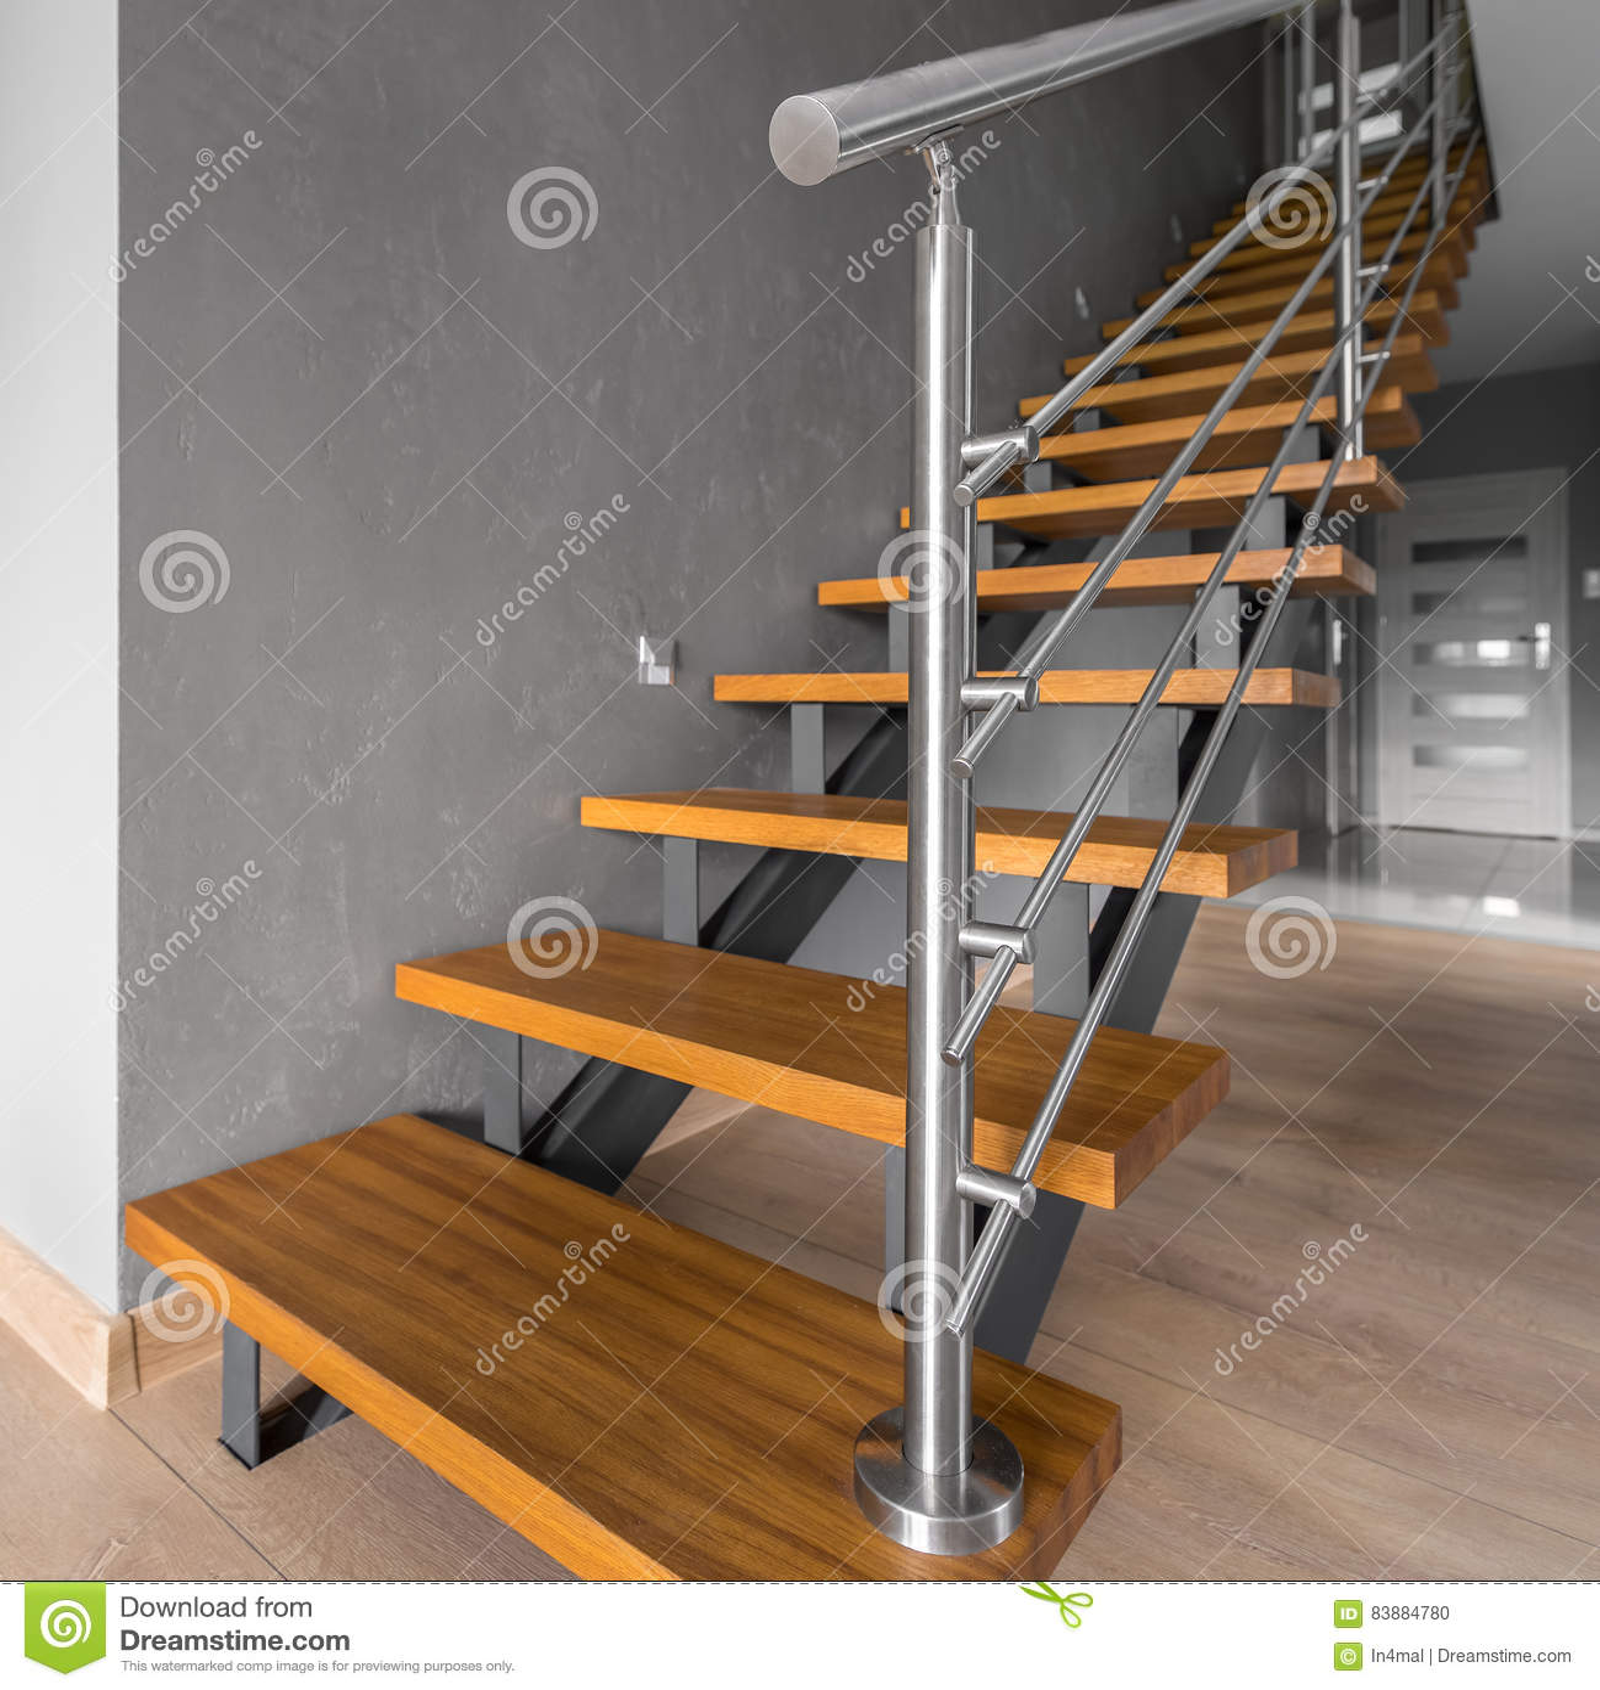 Escalier Simple escalier simple avec la balustrade en acier photo stock - image du